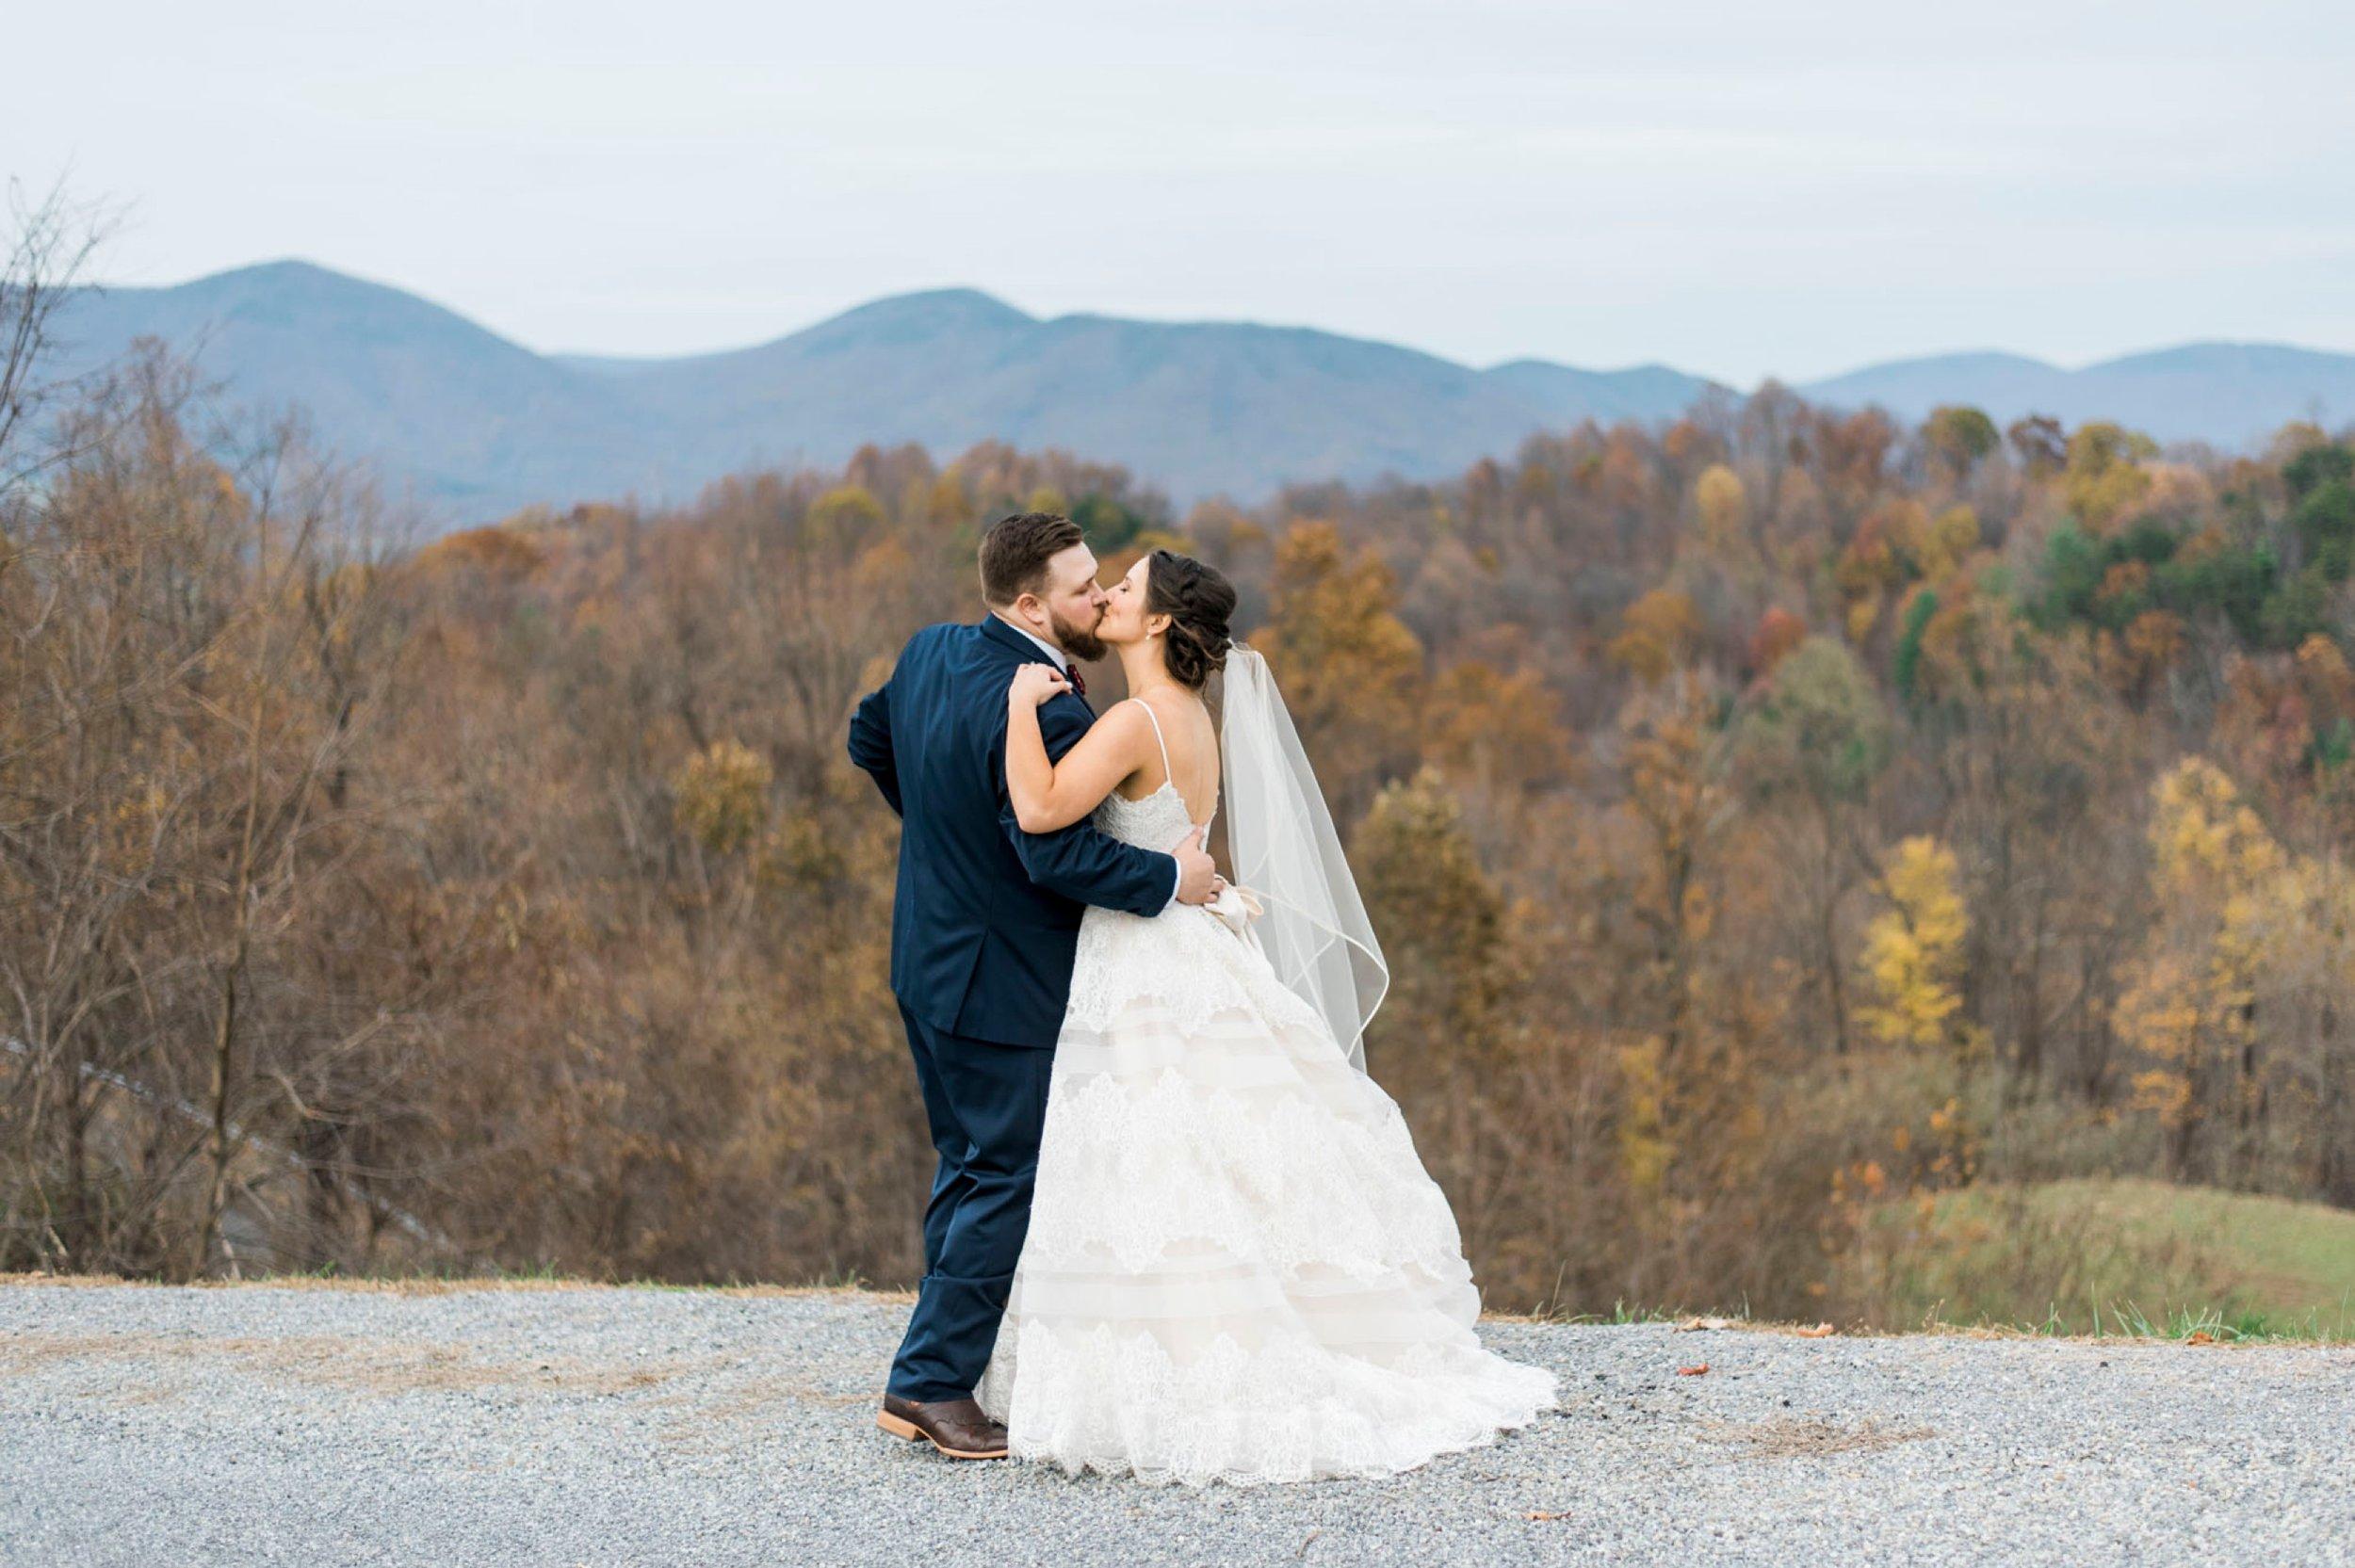 IrvineEstate_LexingtonVA_Wedding_FallWedding_VirginiaWeddingPhotographer 84.jpg